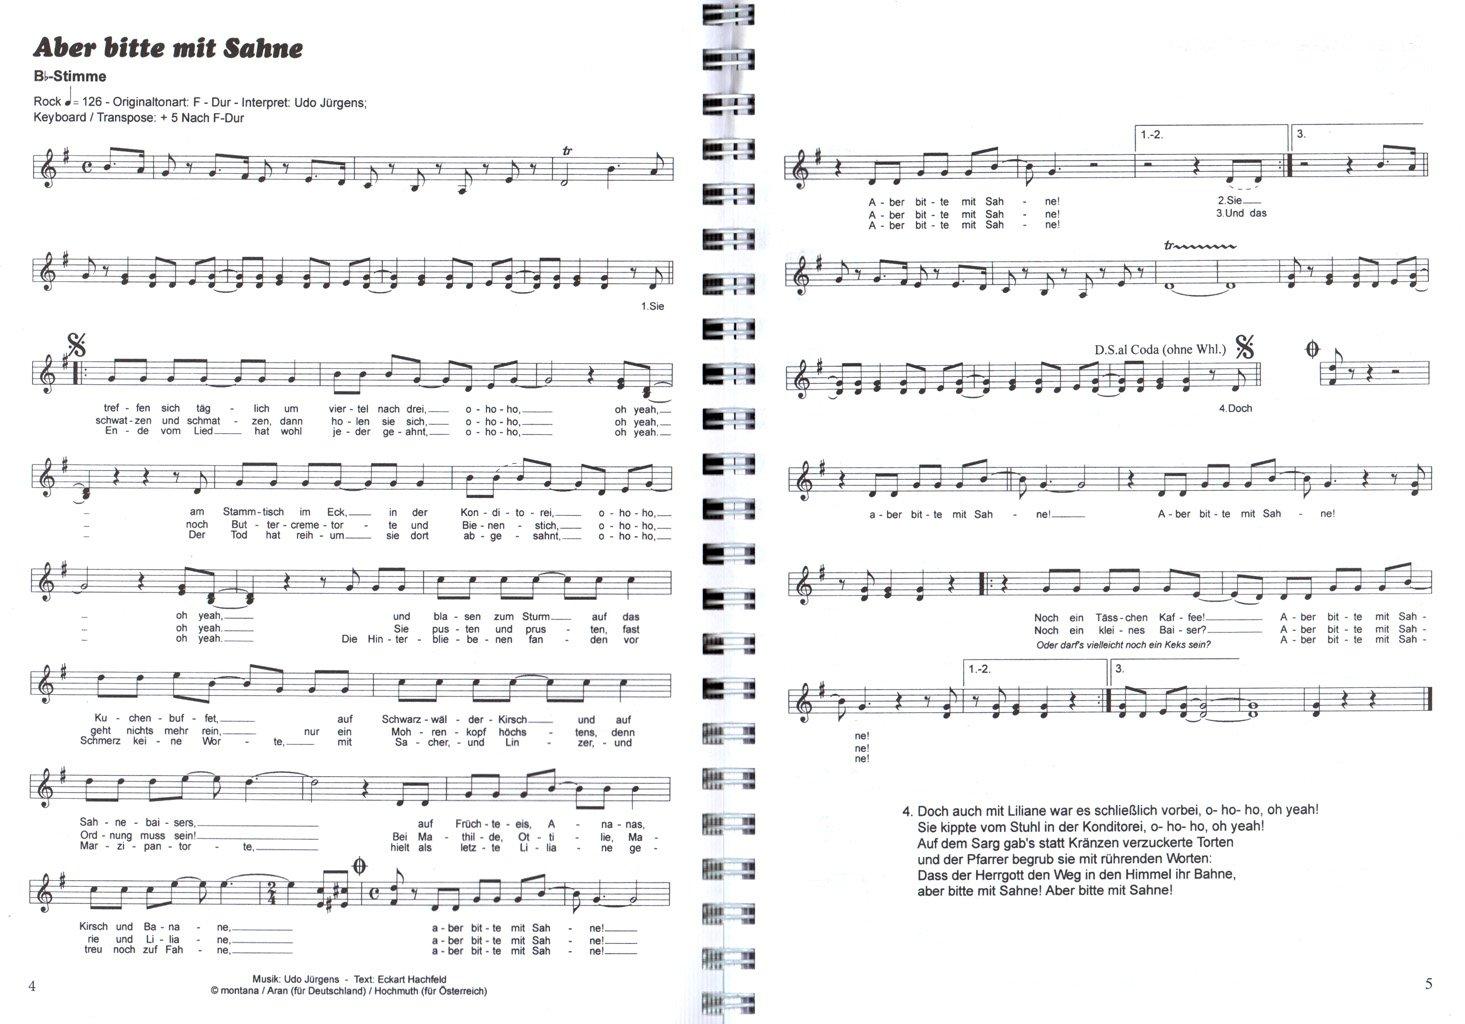 100 Hits para BB y EB Instrumentos - Mejores Evergreens, Schlager, oldies - zweistimmig Sing ligero y spielbar fijado para saxofón, Trompeta, ...